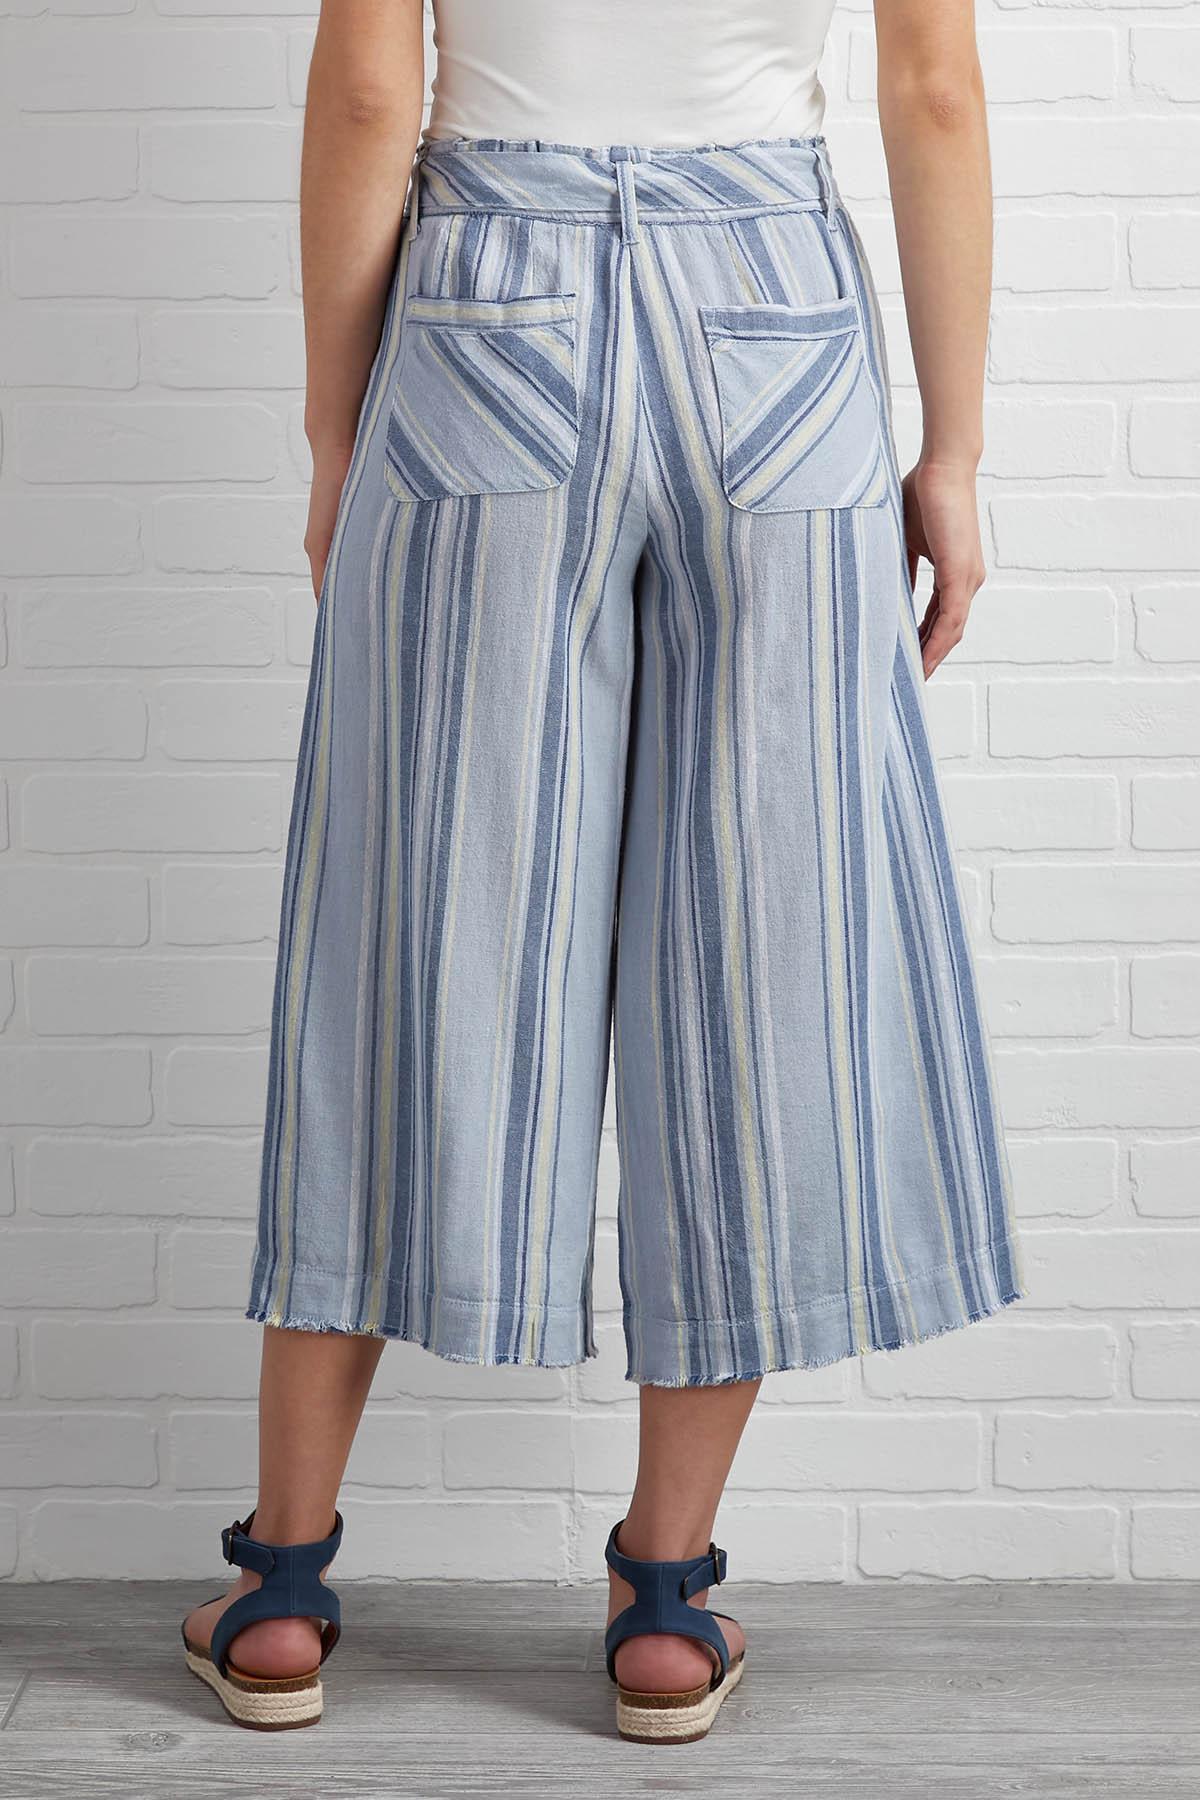 Finders Keepers Pants